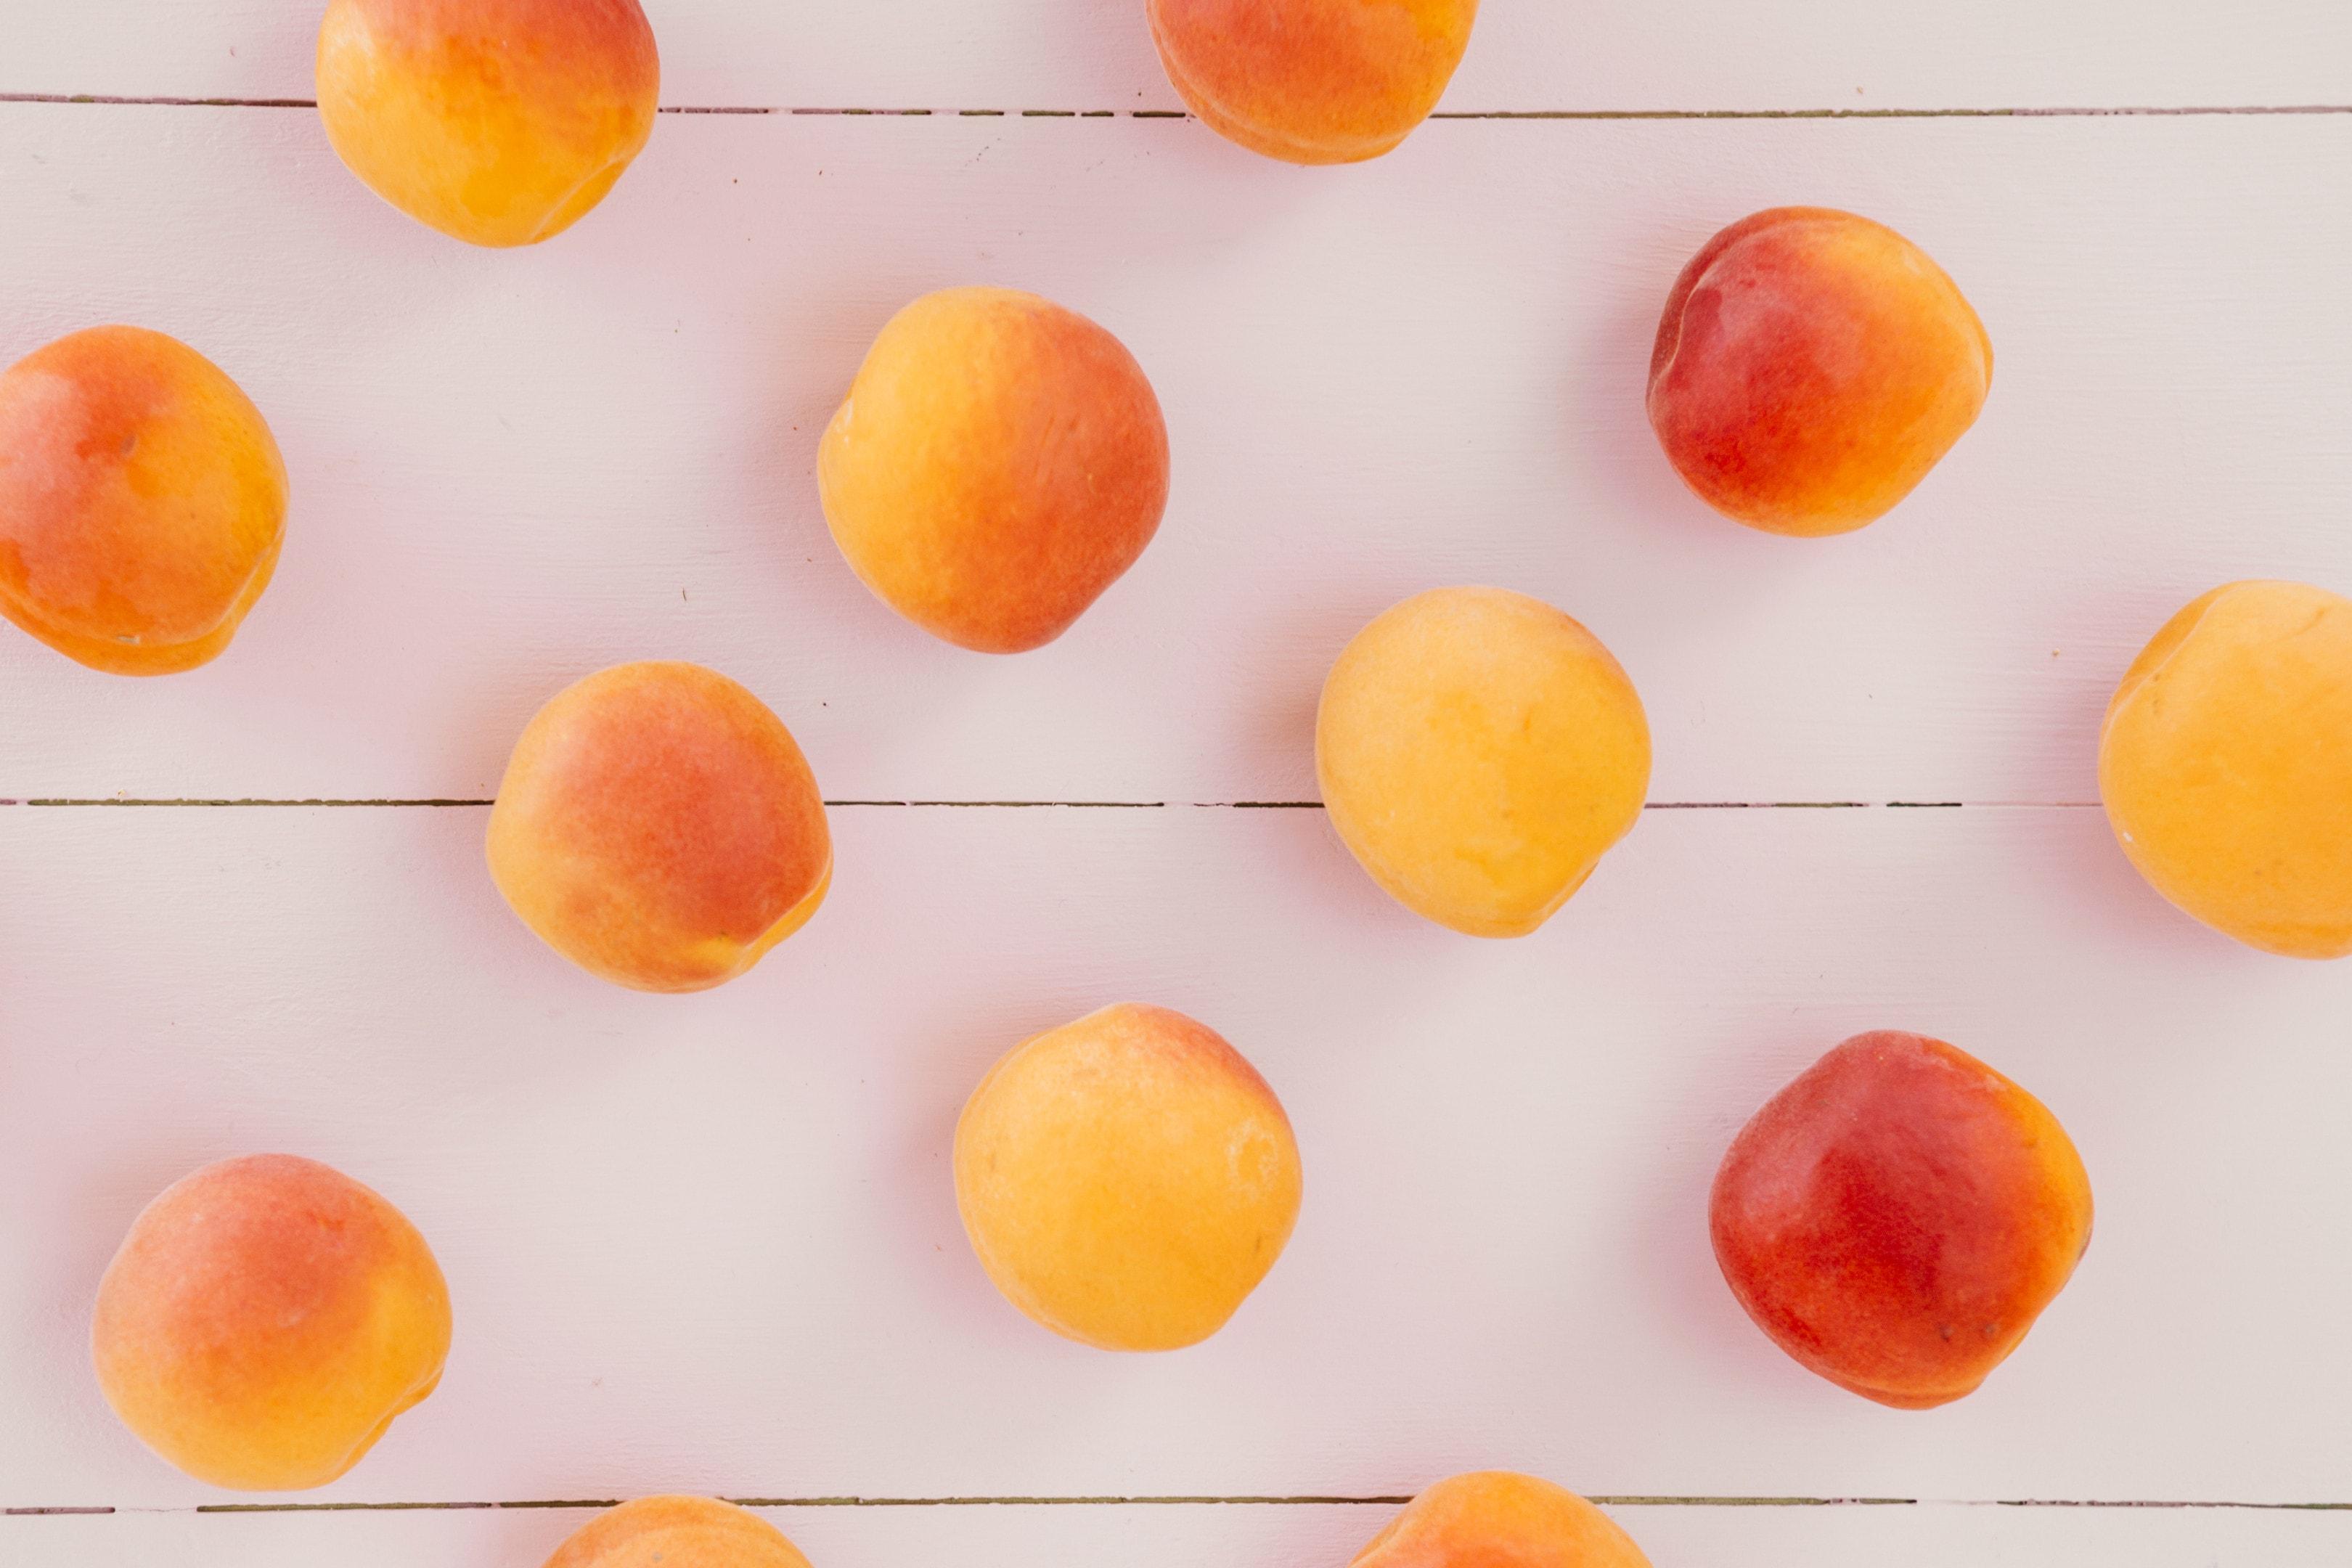 Fresh Peach Fruits on Wooden Desk